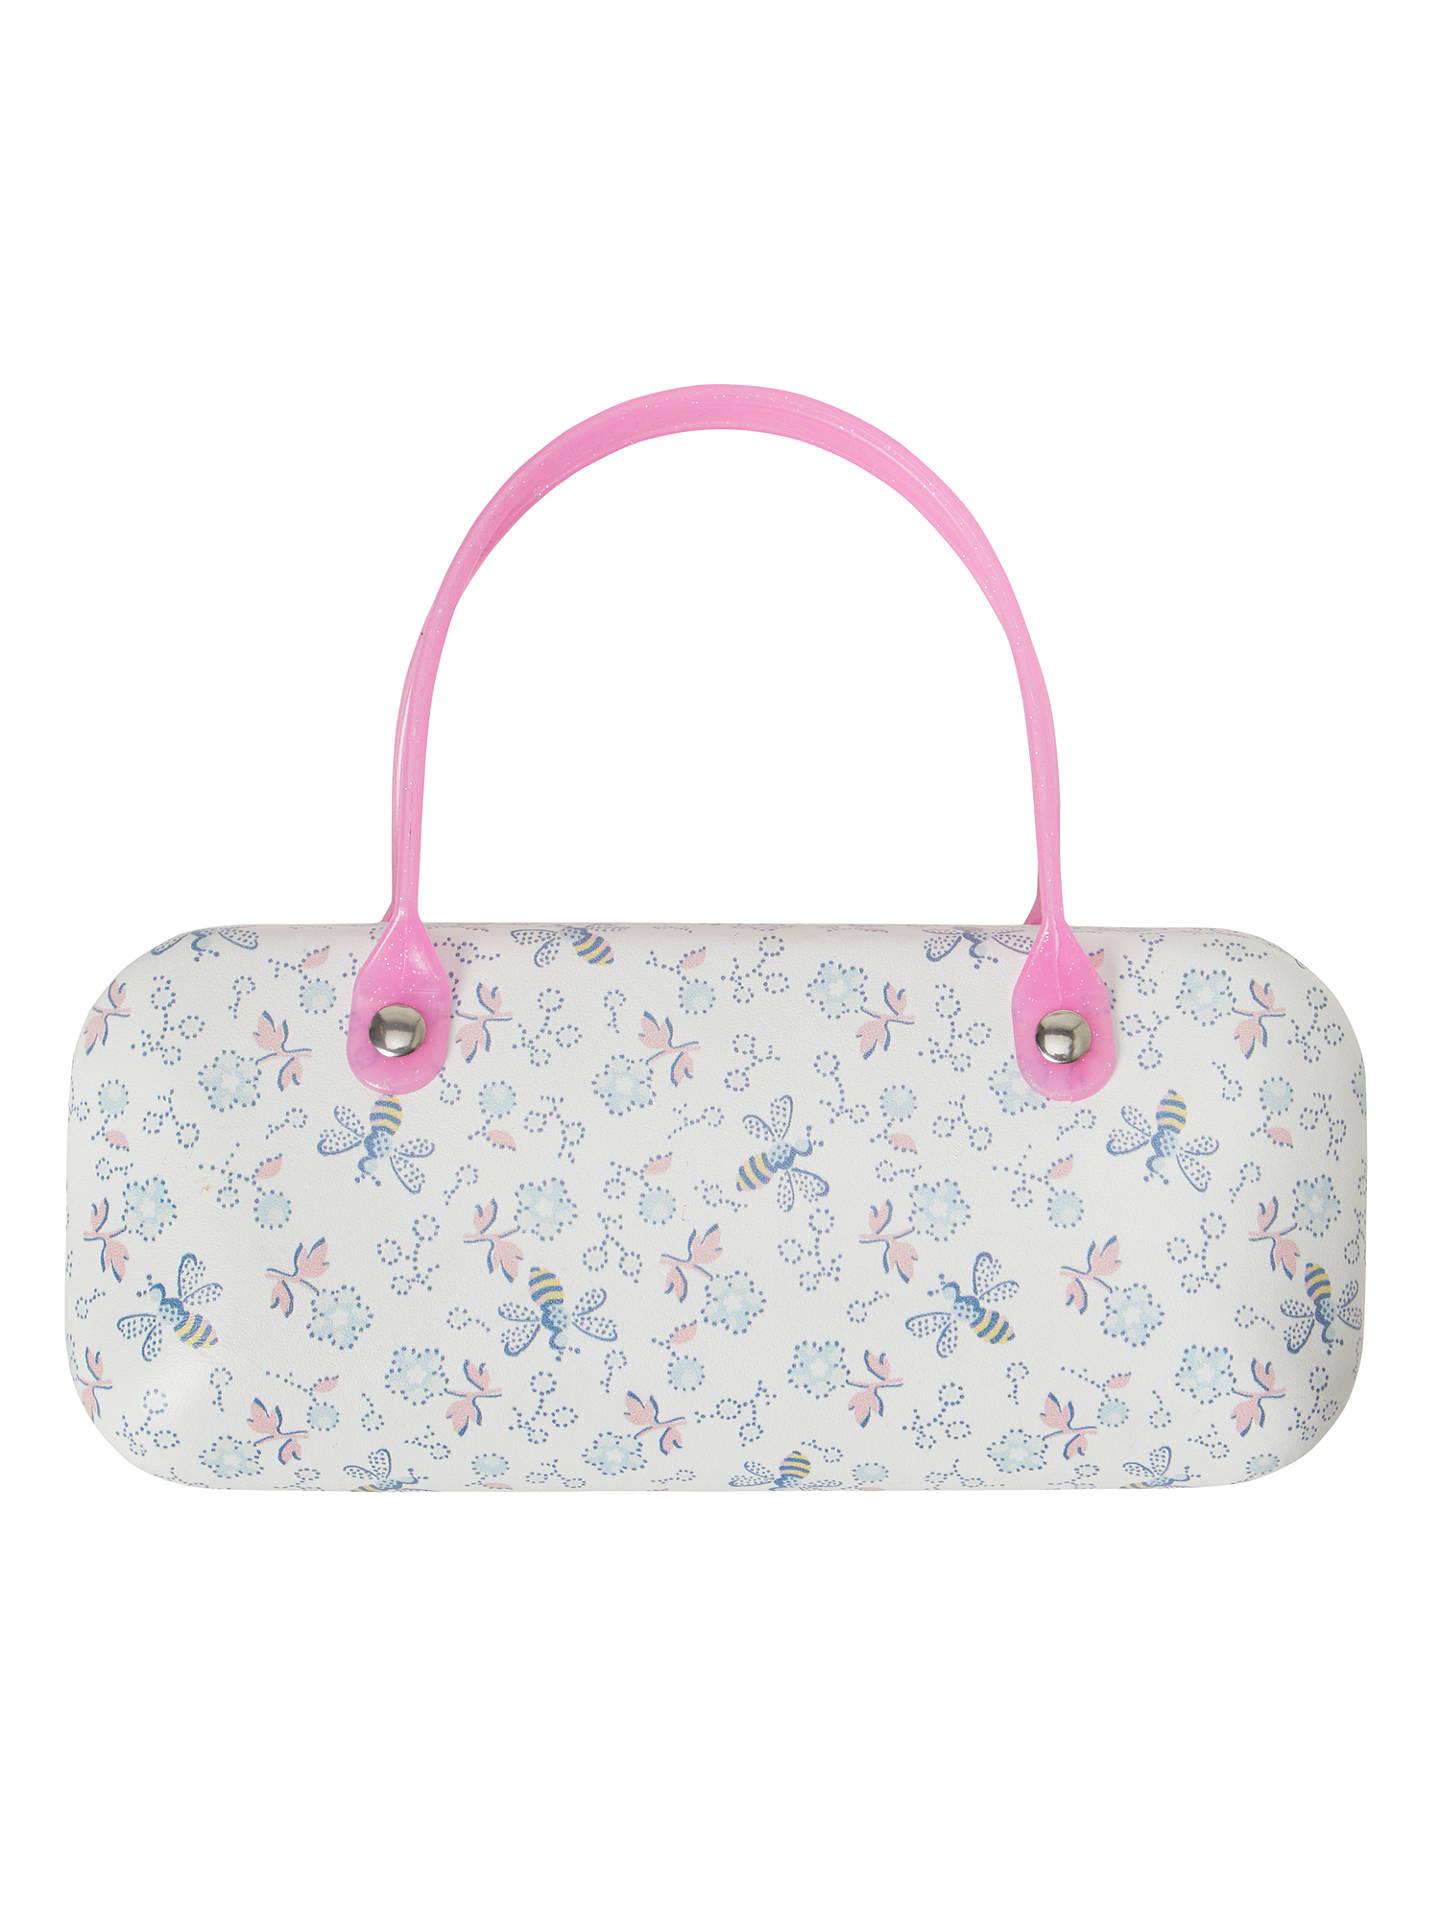 936b52cba0d98 Buy John Lewis   Partners Children s Floral Sunglasses Case